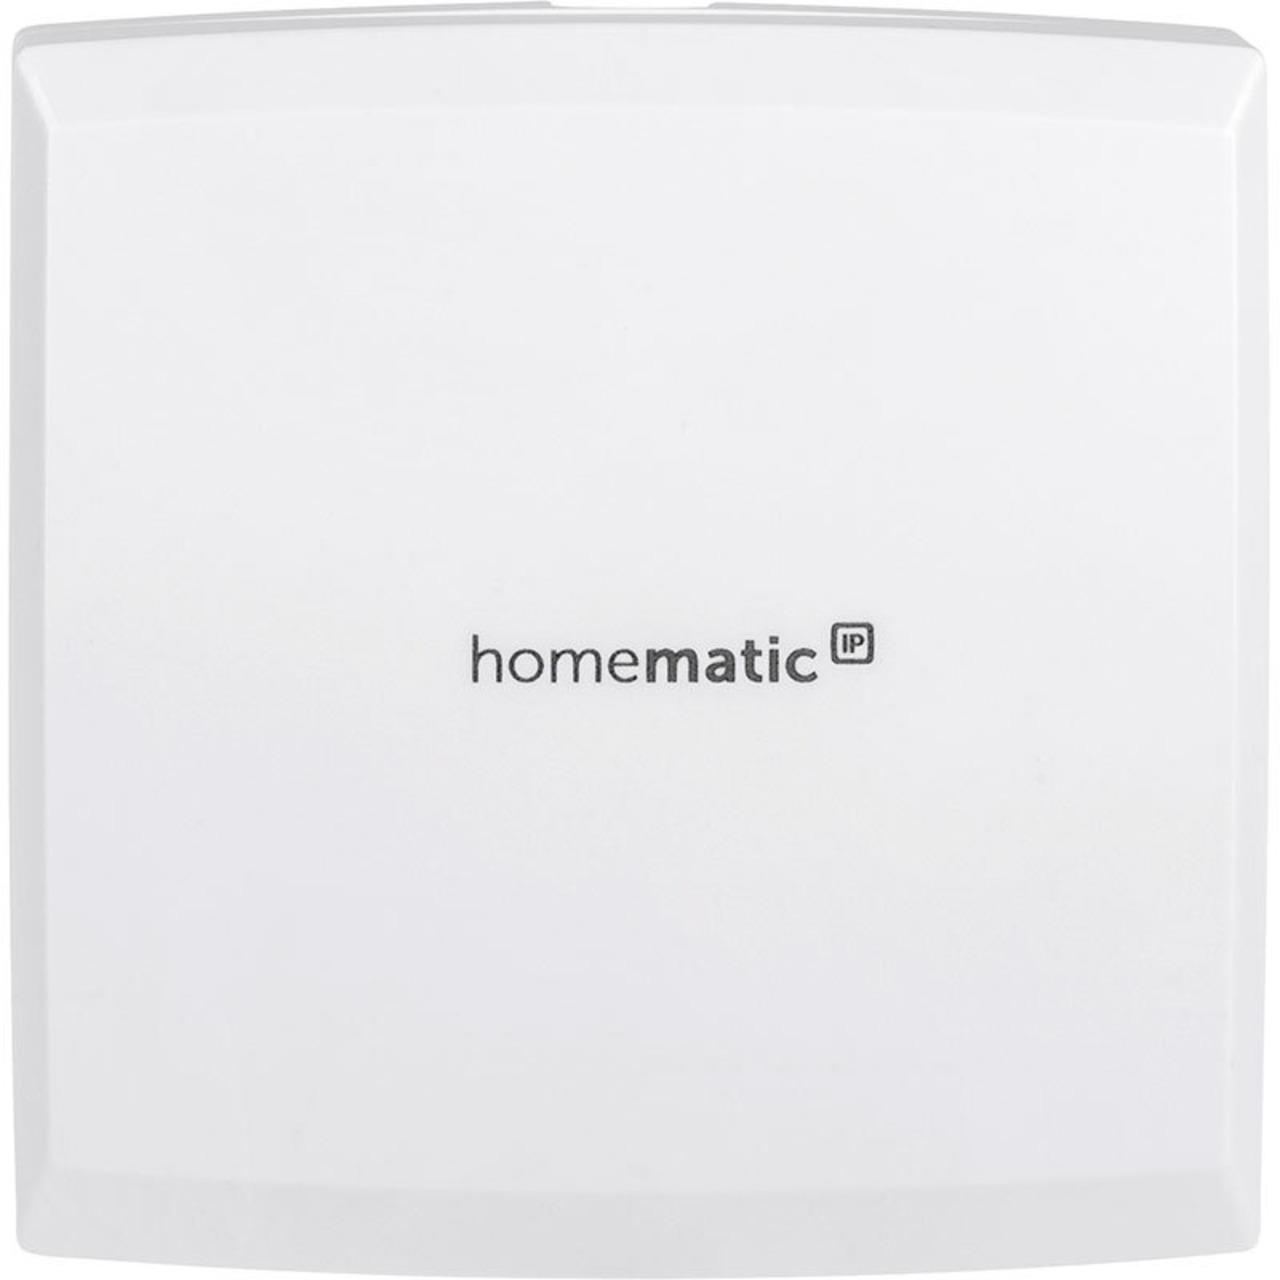 ELV Homematic IP Bausatz Garagentortaster/Schaltaktor HmIP-WGC- fernbedienbar